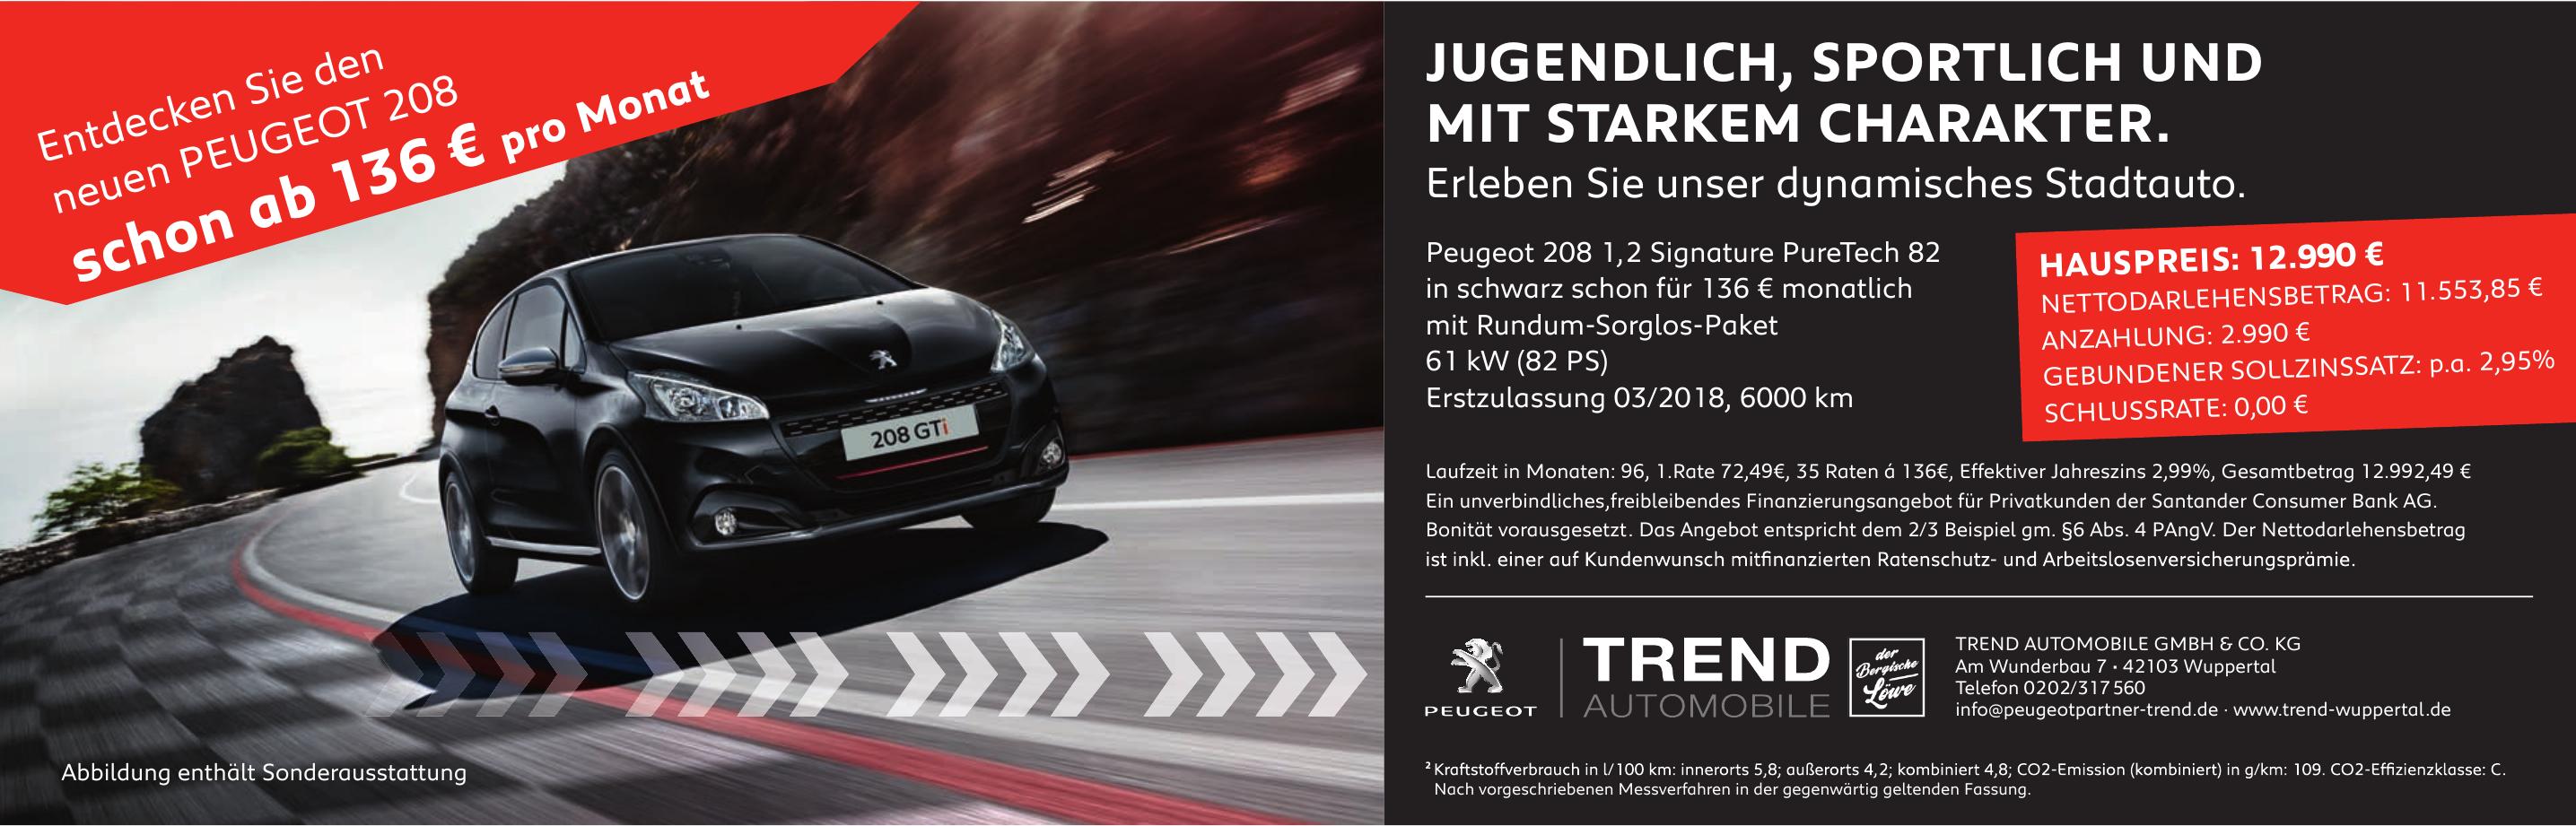 Trend Automobile GmbH & Co. KG